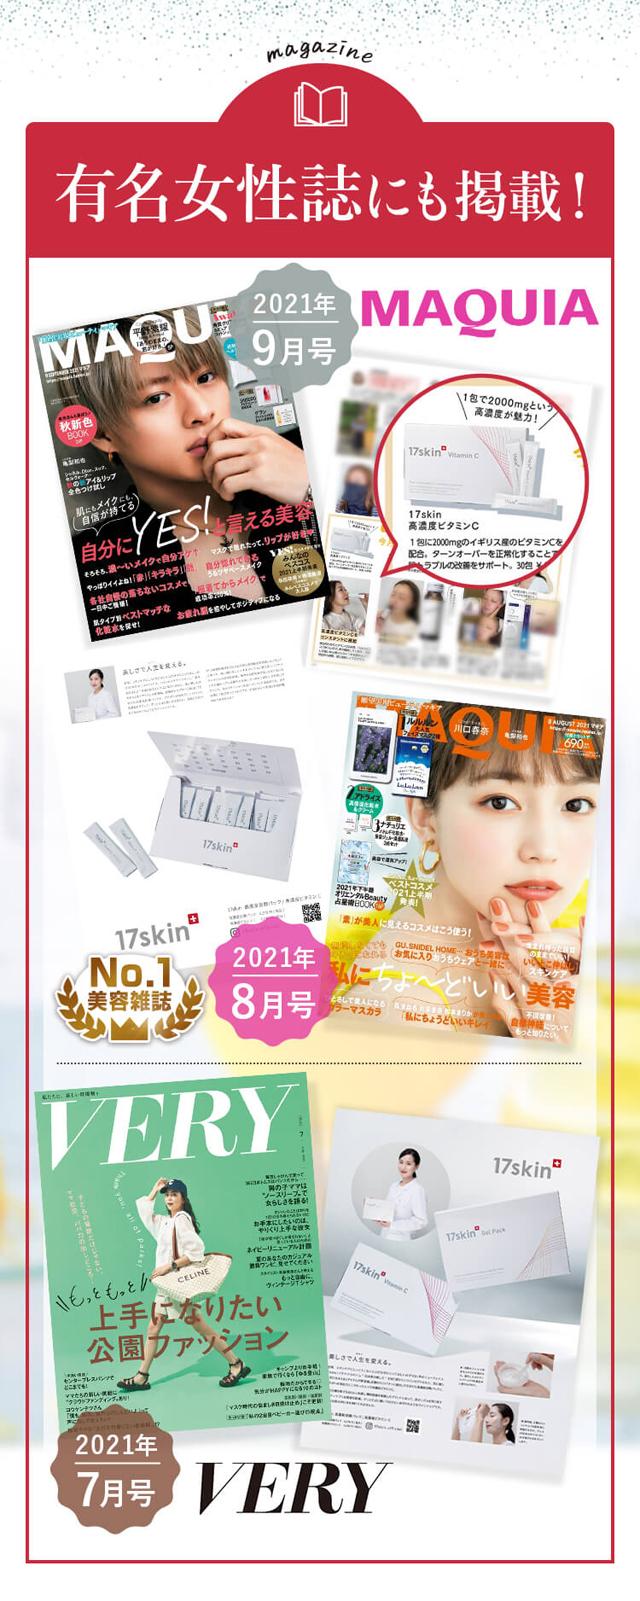 17skin高濃度ビタミンC,雑誌,特集,人気